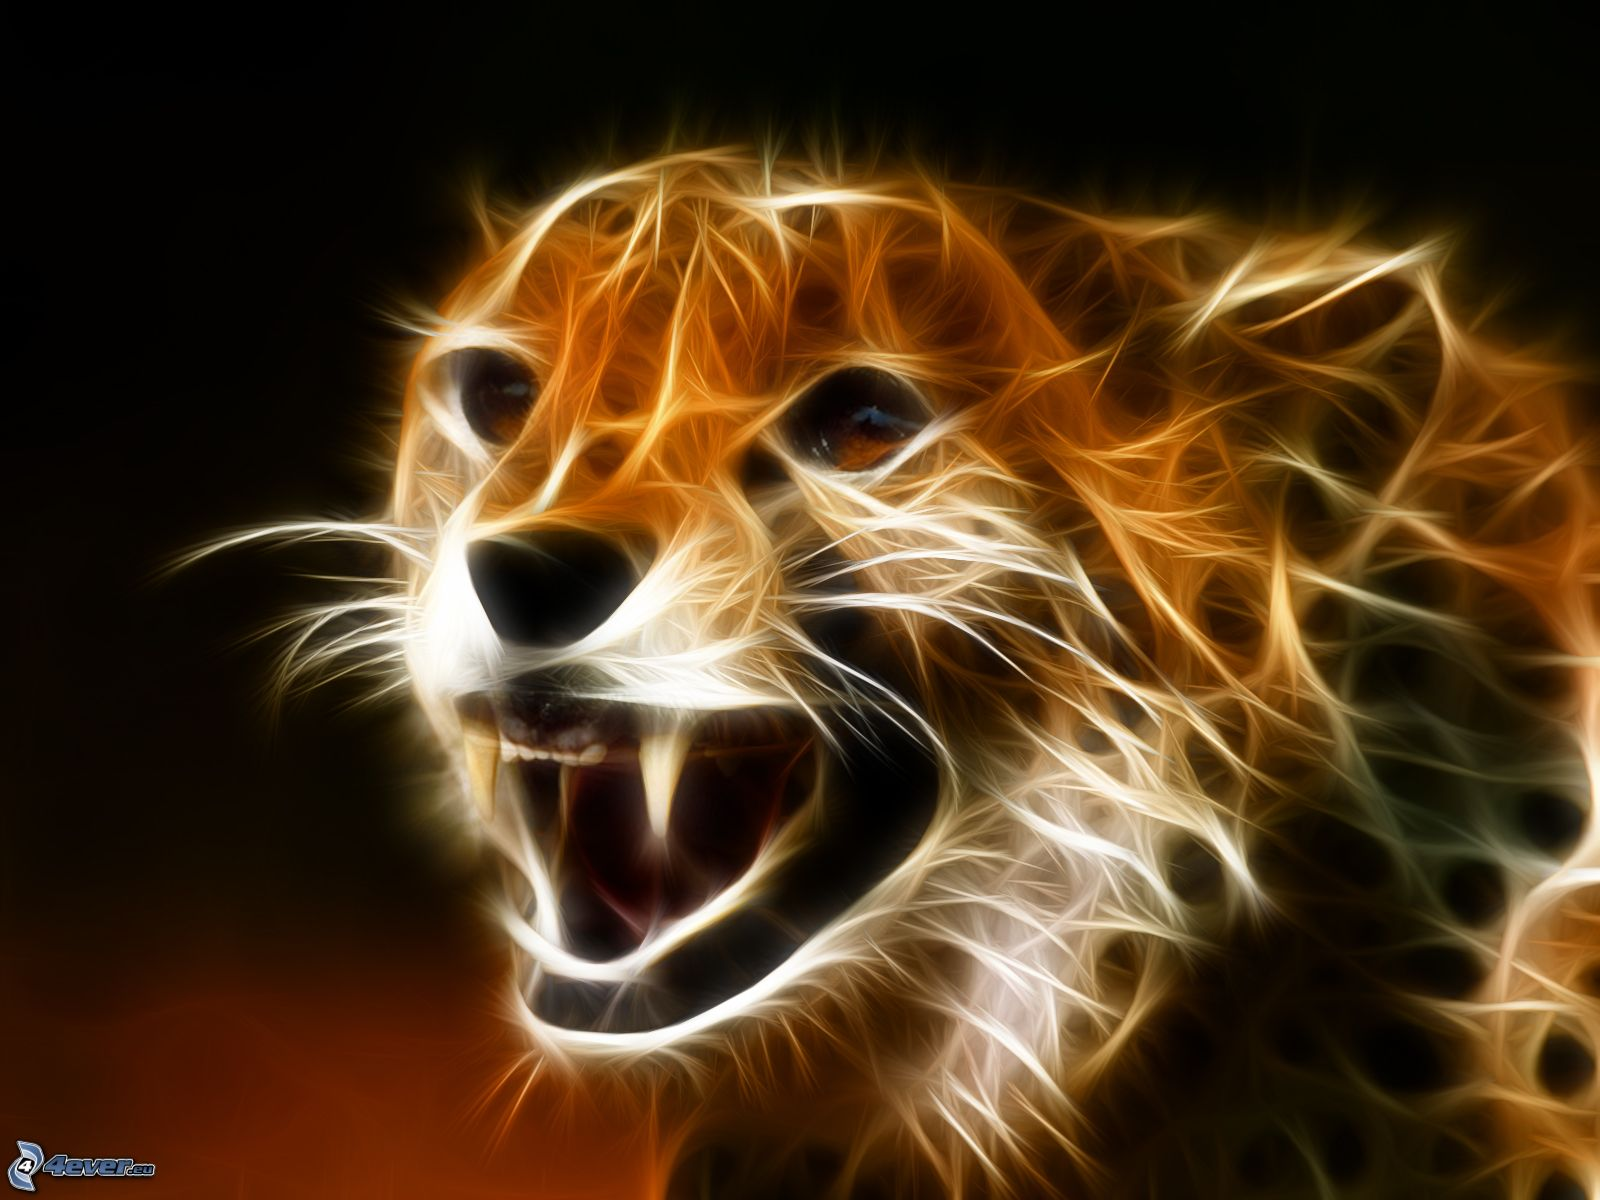 25 fractales de animales hd alguno va a gustarte taringa for Sfondi desktop 3d